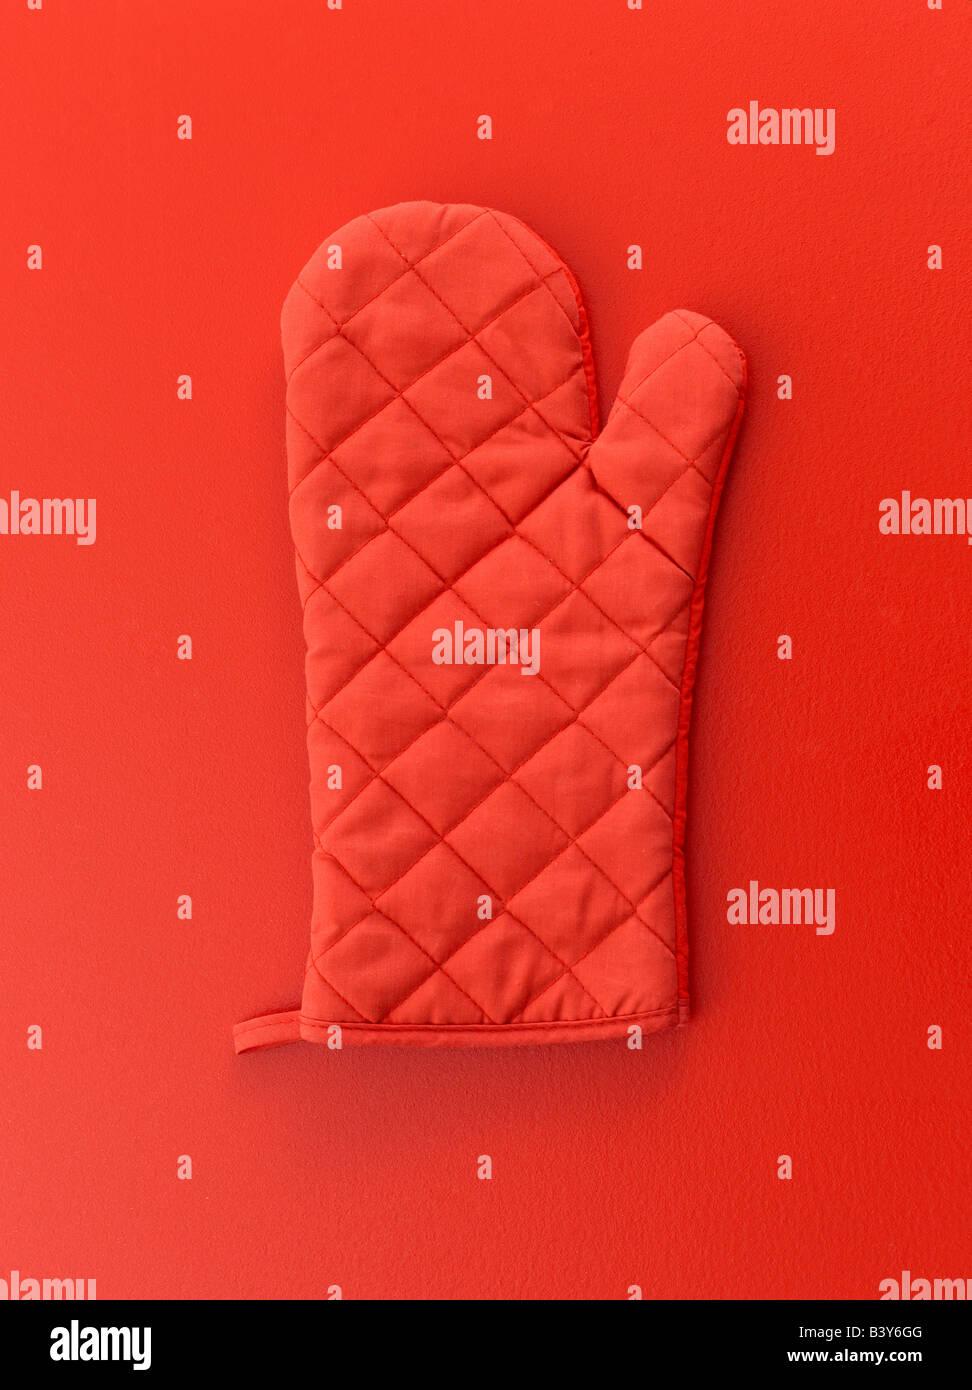 Manopla roja sobre fondo rojo. Imagen De Stock